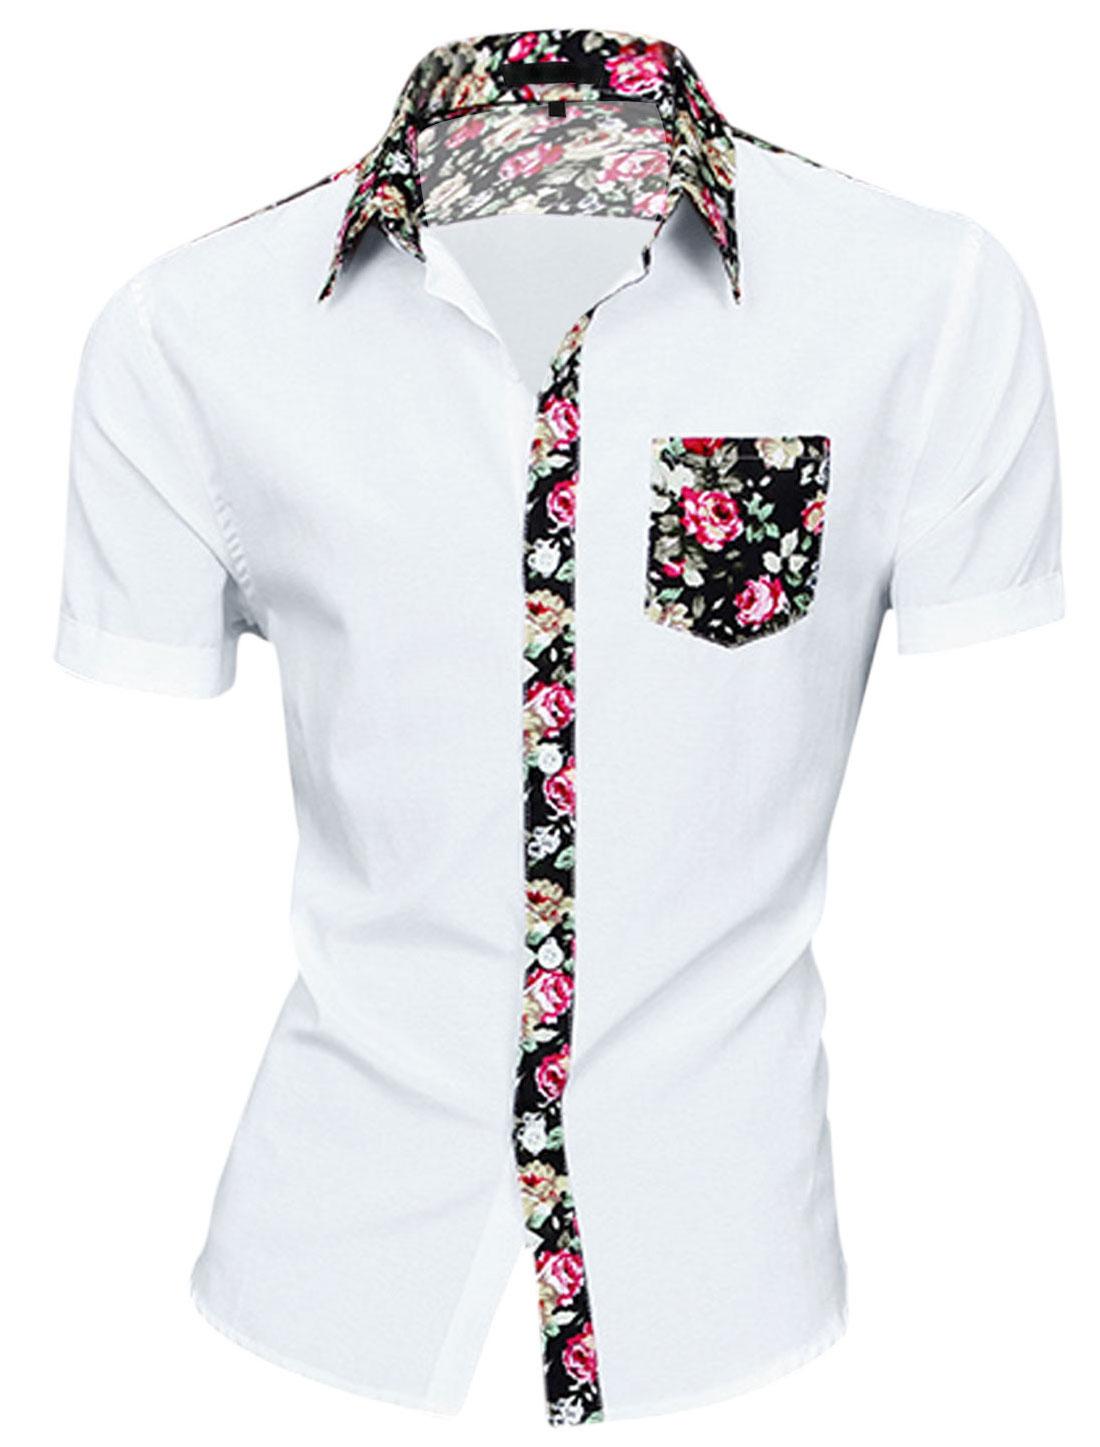 Men Short Sleeve Floral Print Button Down Slim Fit Shirt White M